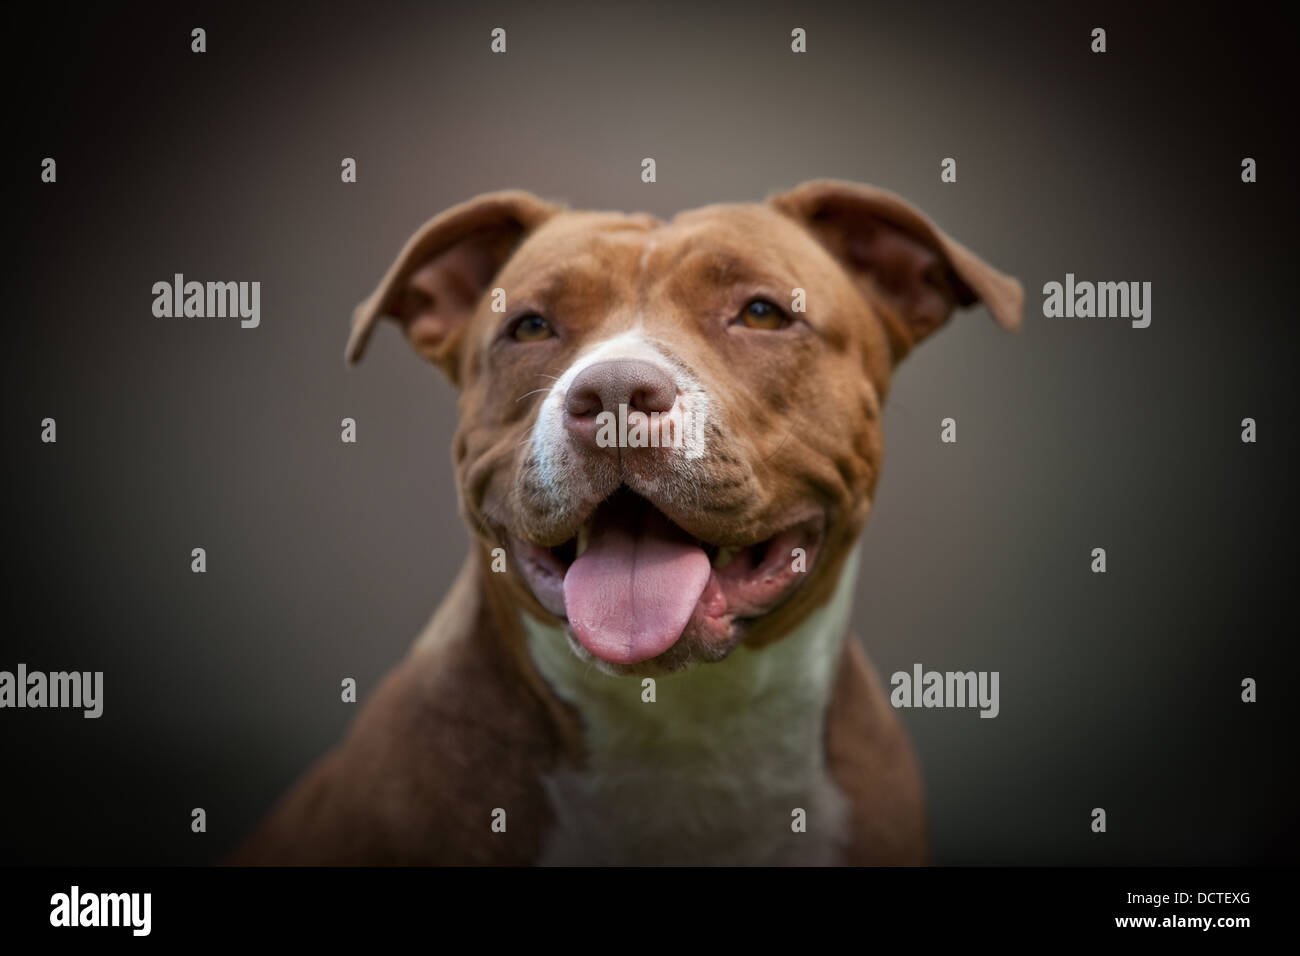 Studio Portrait of a dog - Stock Image